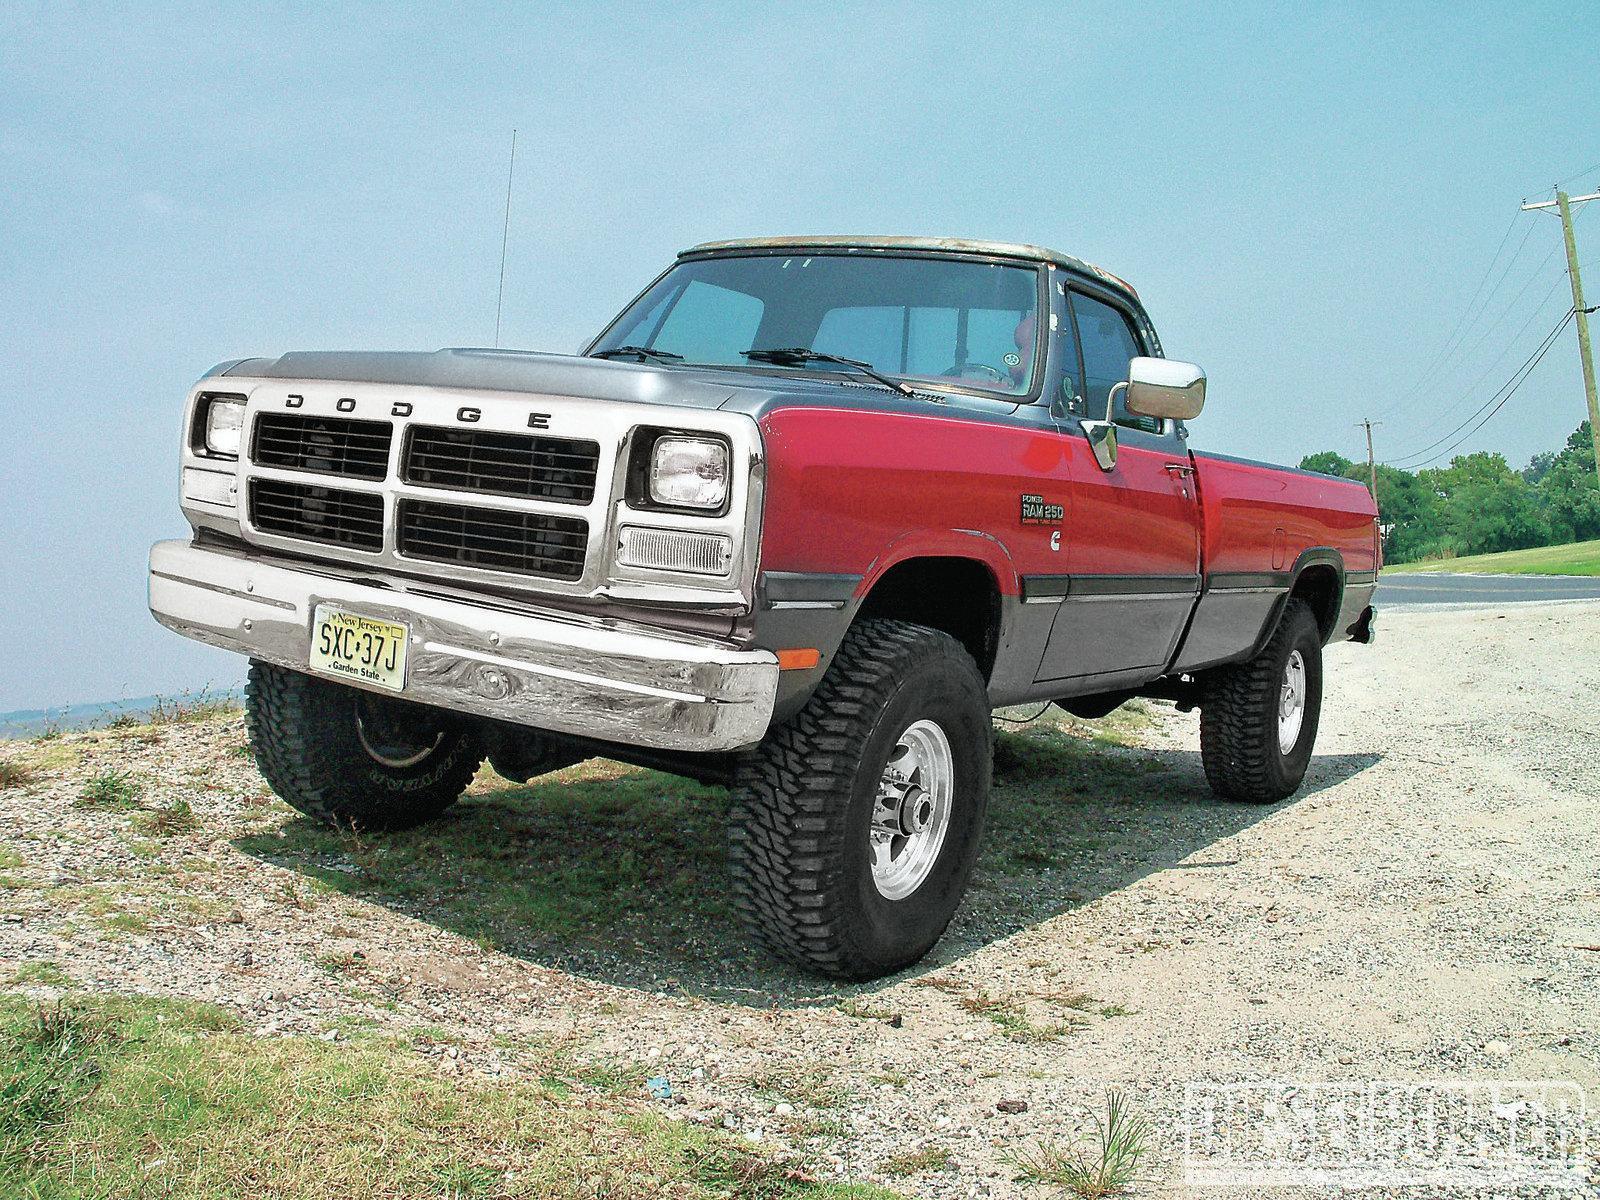 1991 Dodge RAM 350 #3 Dodge RAM 350 #3 800 1024 1280 1600 origin ...